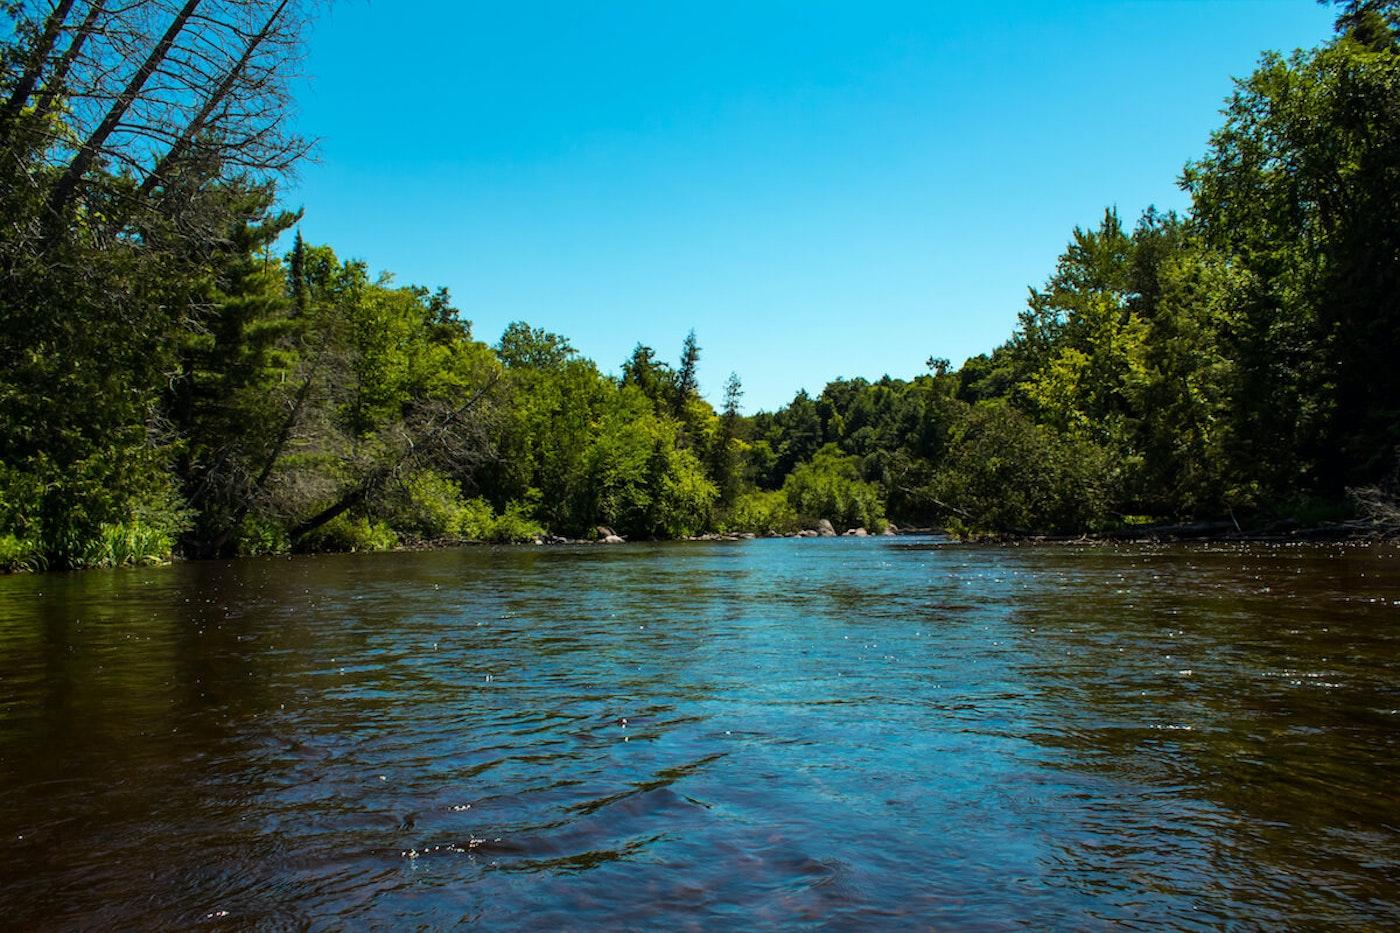 Wisconsin's Wolf River (Image via Shutterstock)